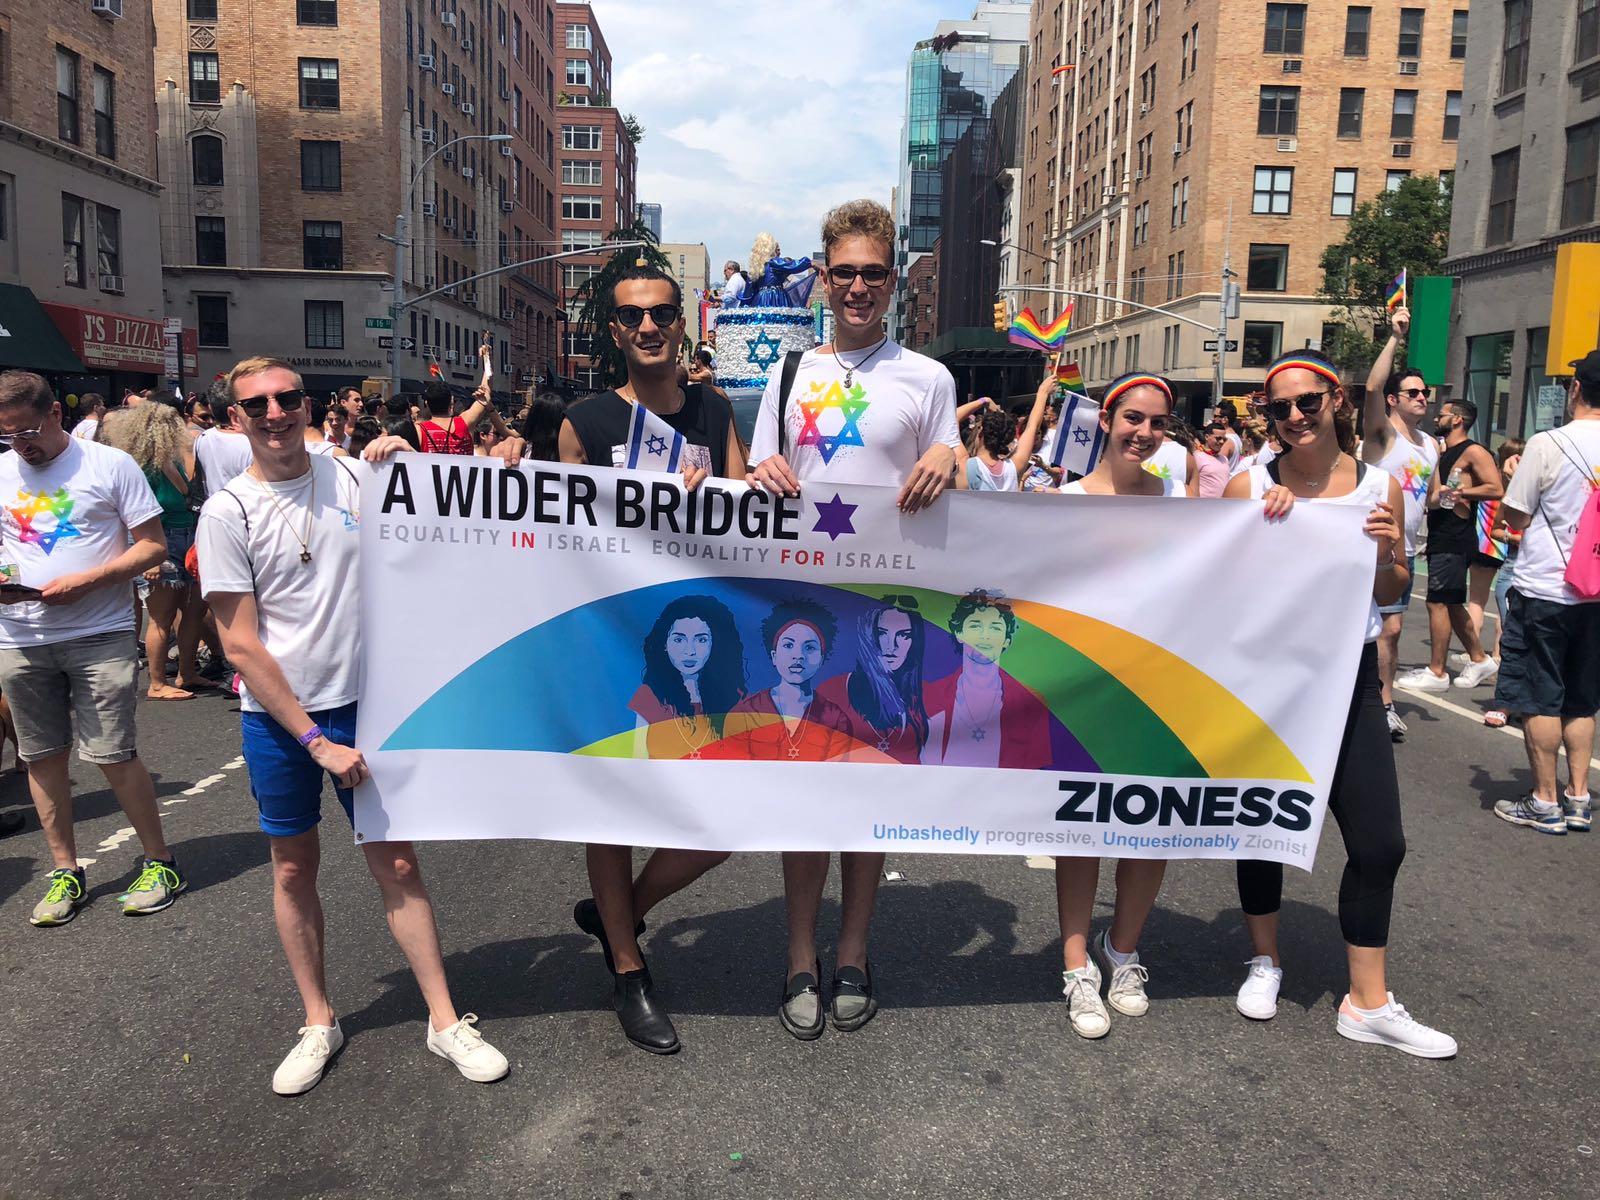 Pride 2018: A Wider Bridge Celebrates Coast to Coast